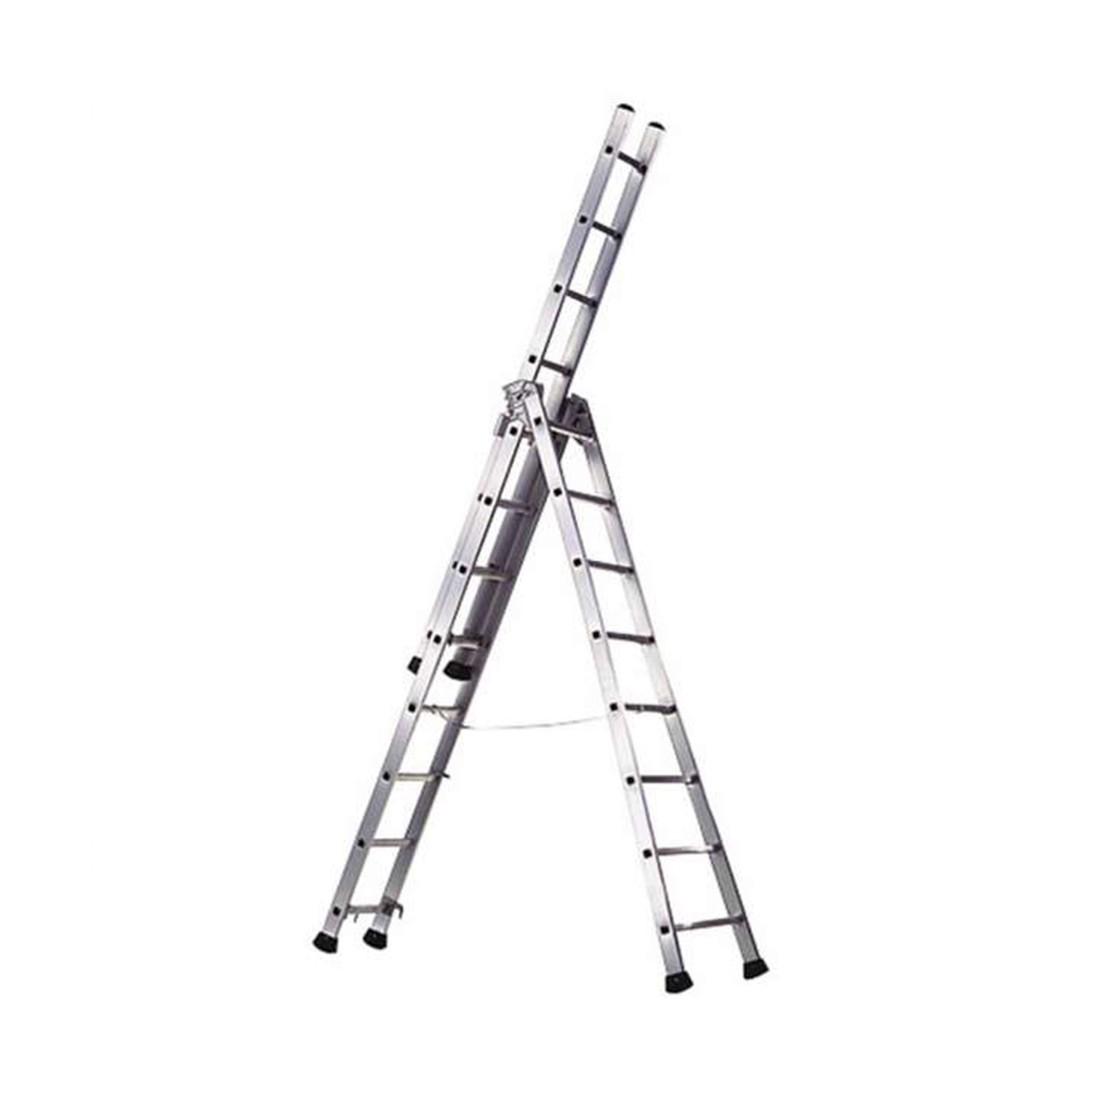 Alquiler de escalera extensible tijera 3 tramos de 9 70m for Escaleras extensibles